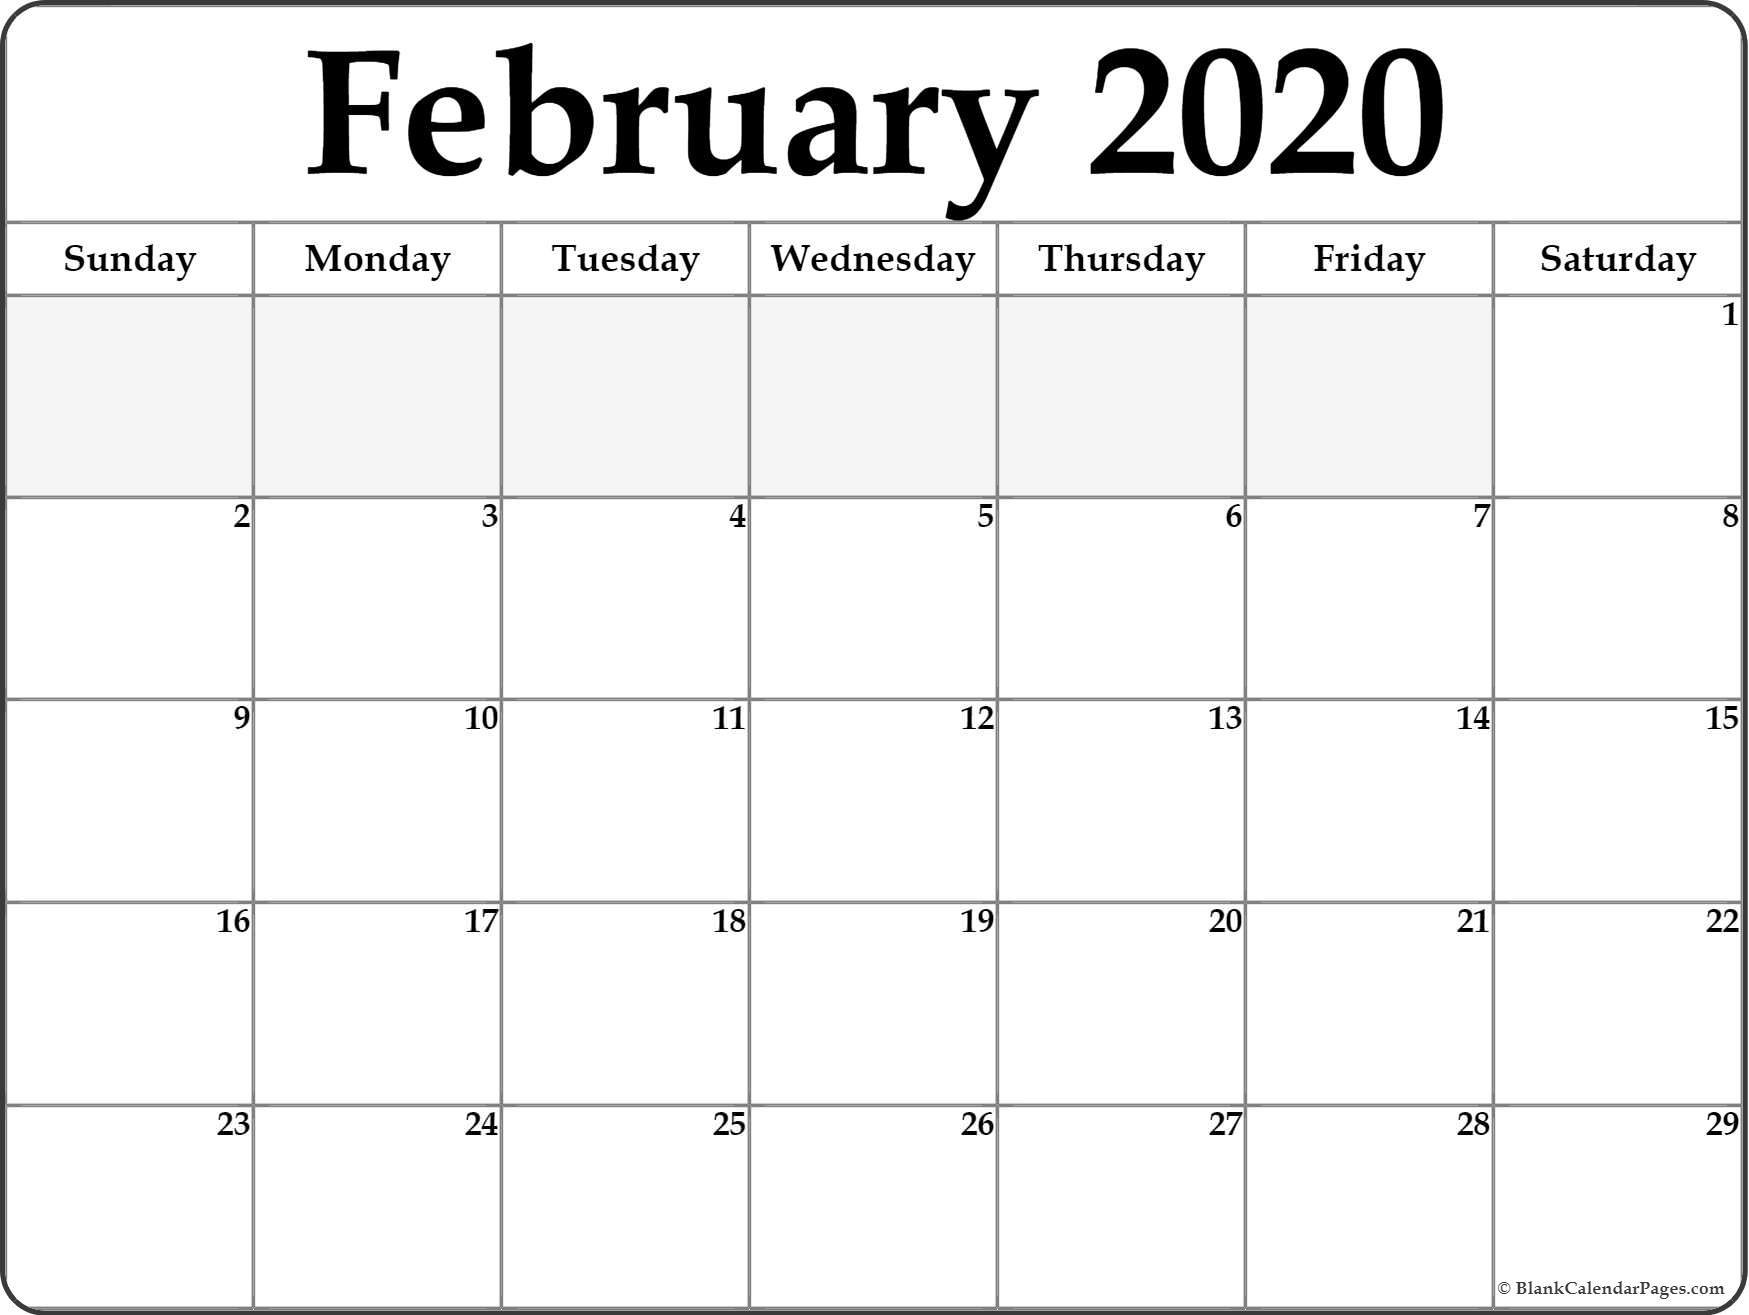 Blank February 2020 Calendar Printable February 2020 Free Printable Blank Calendar Collection